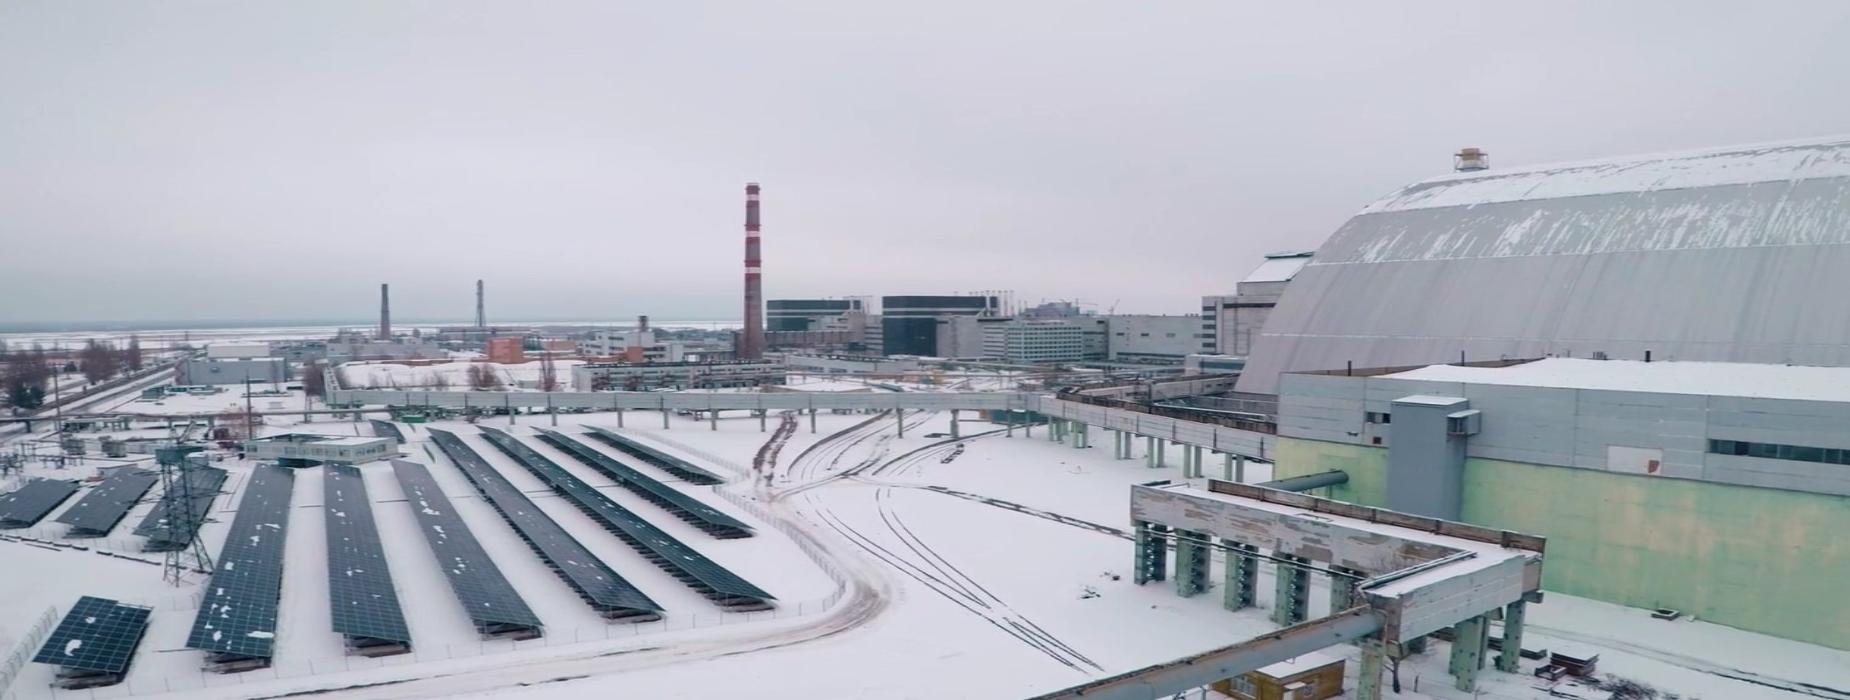 chernobyl disaster site solar farm